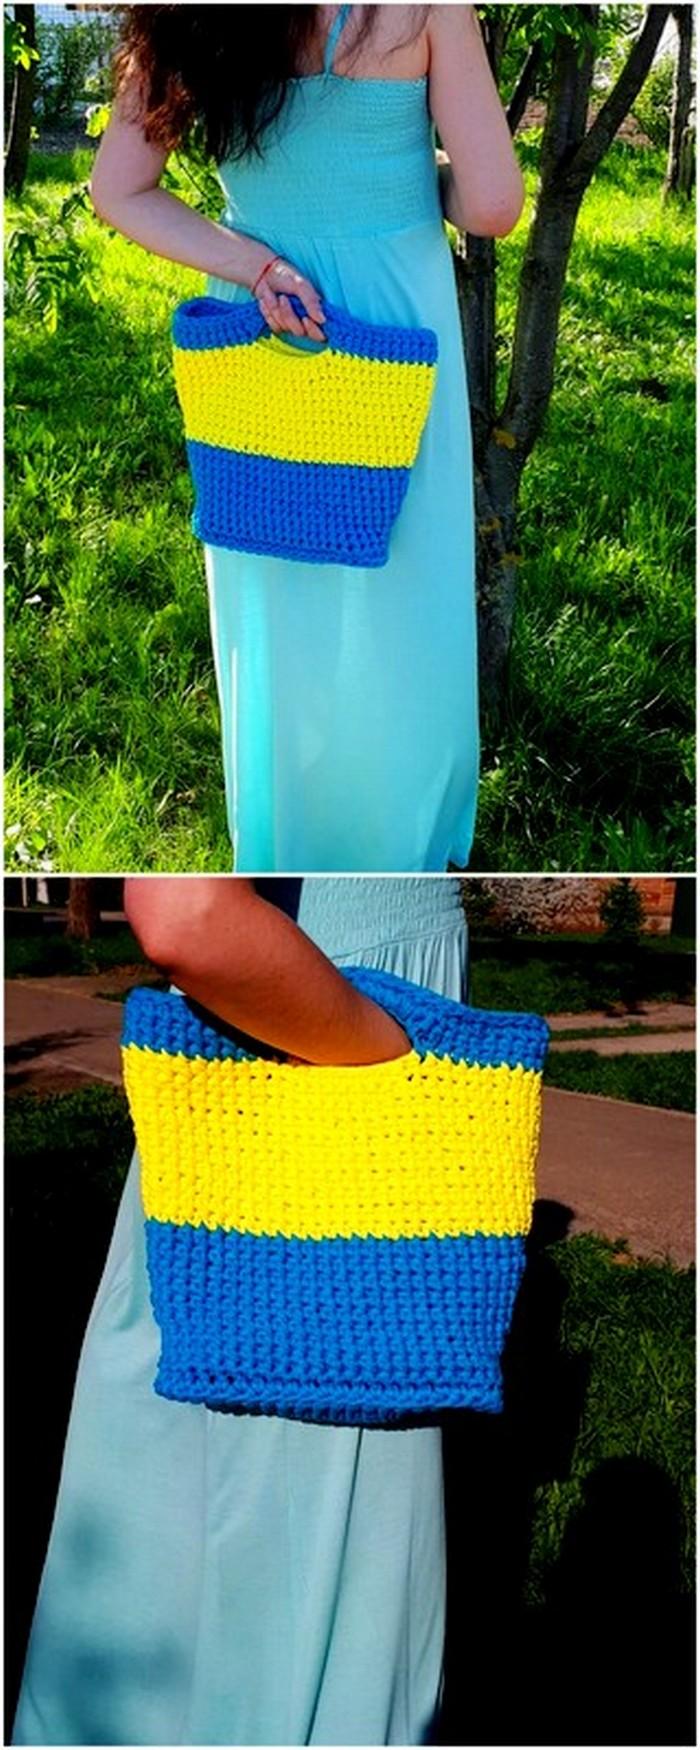 colorful crochet handbag design